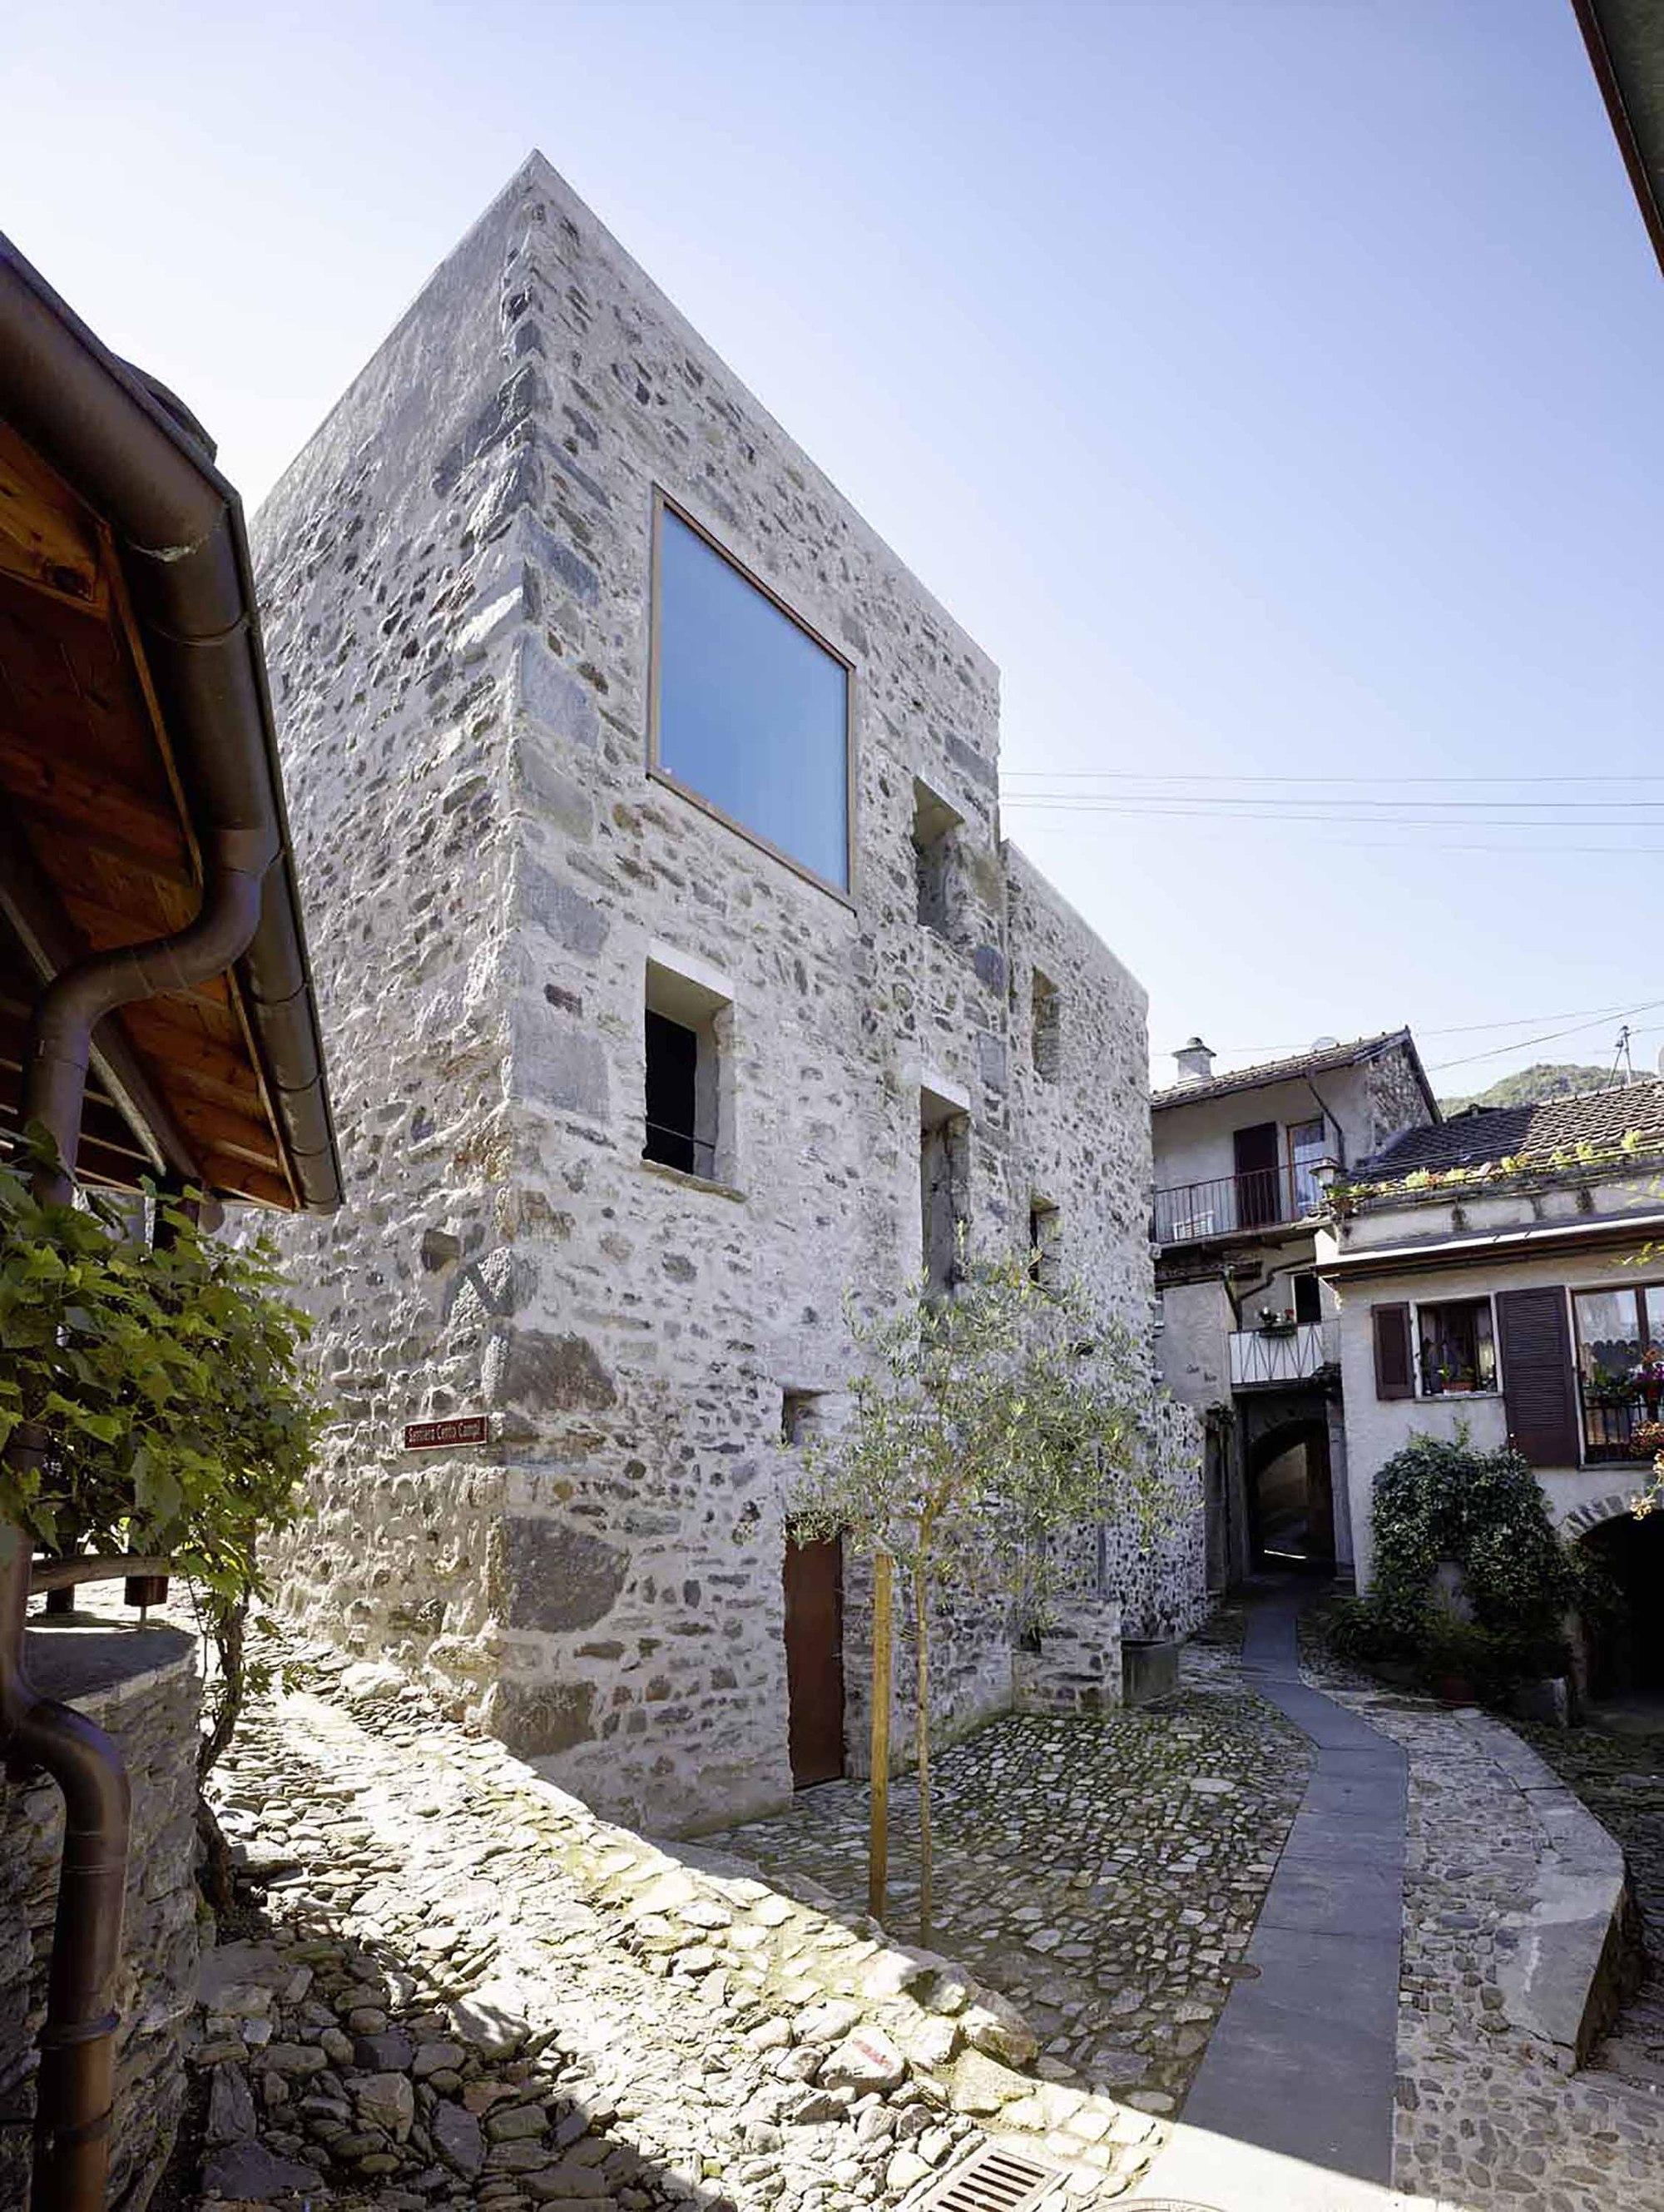 543dd585c07a80762d00024a_stone-house-transformation-in-scaiano-wespi-de-meuron-romeo-architects_1430_cf029706.jpg